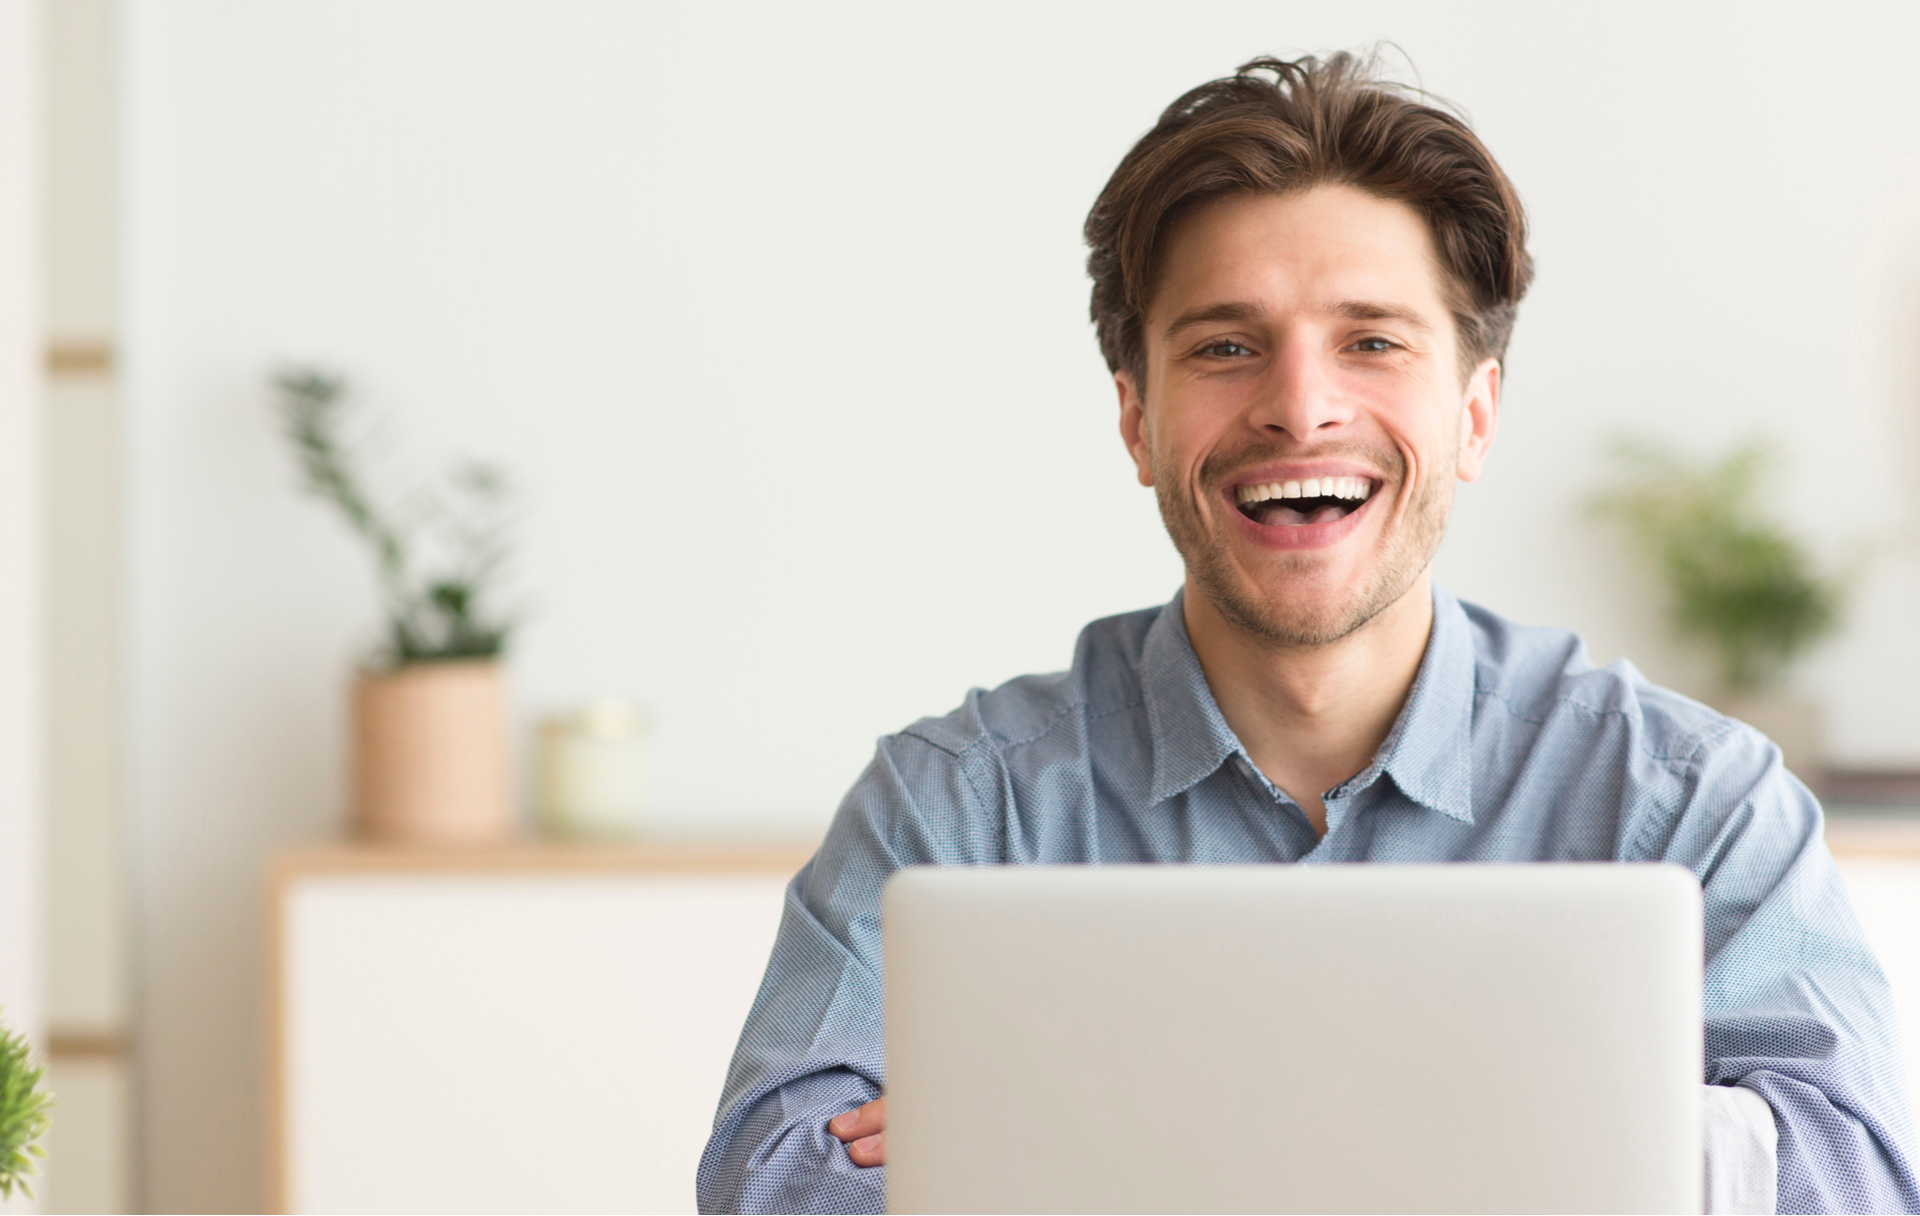 Man Sitting At Laptop And Laughing Looking At Camera Indoor